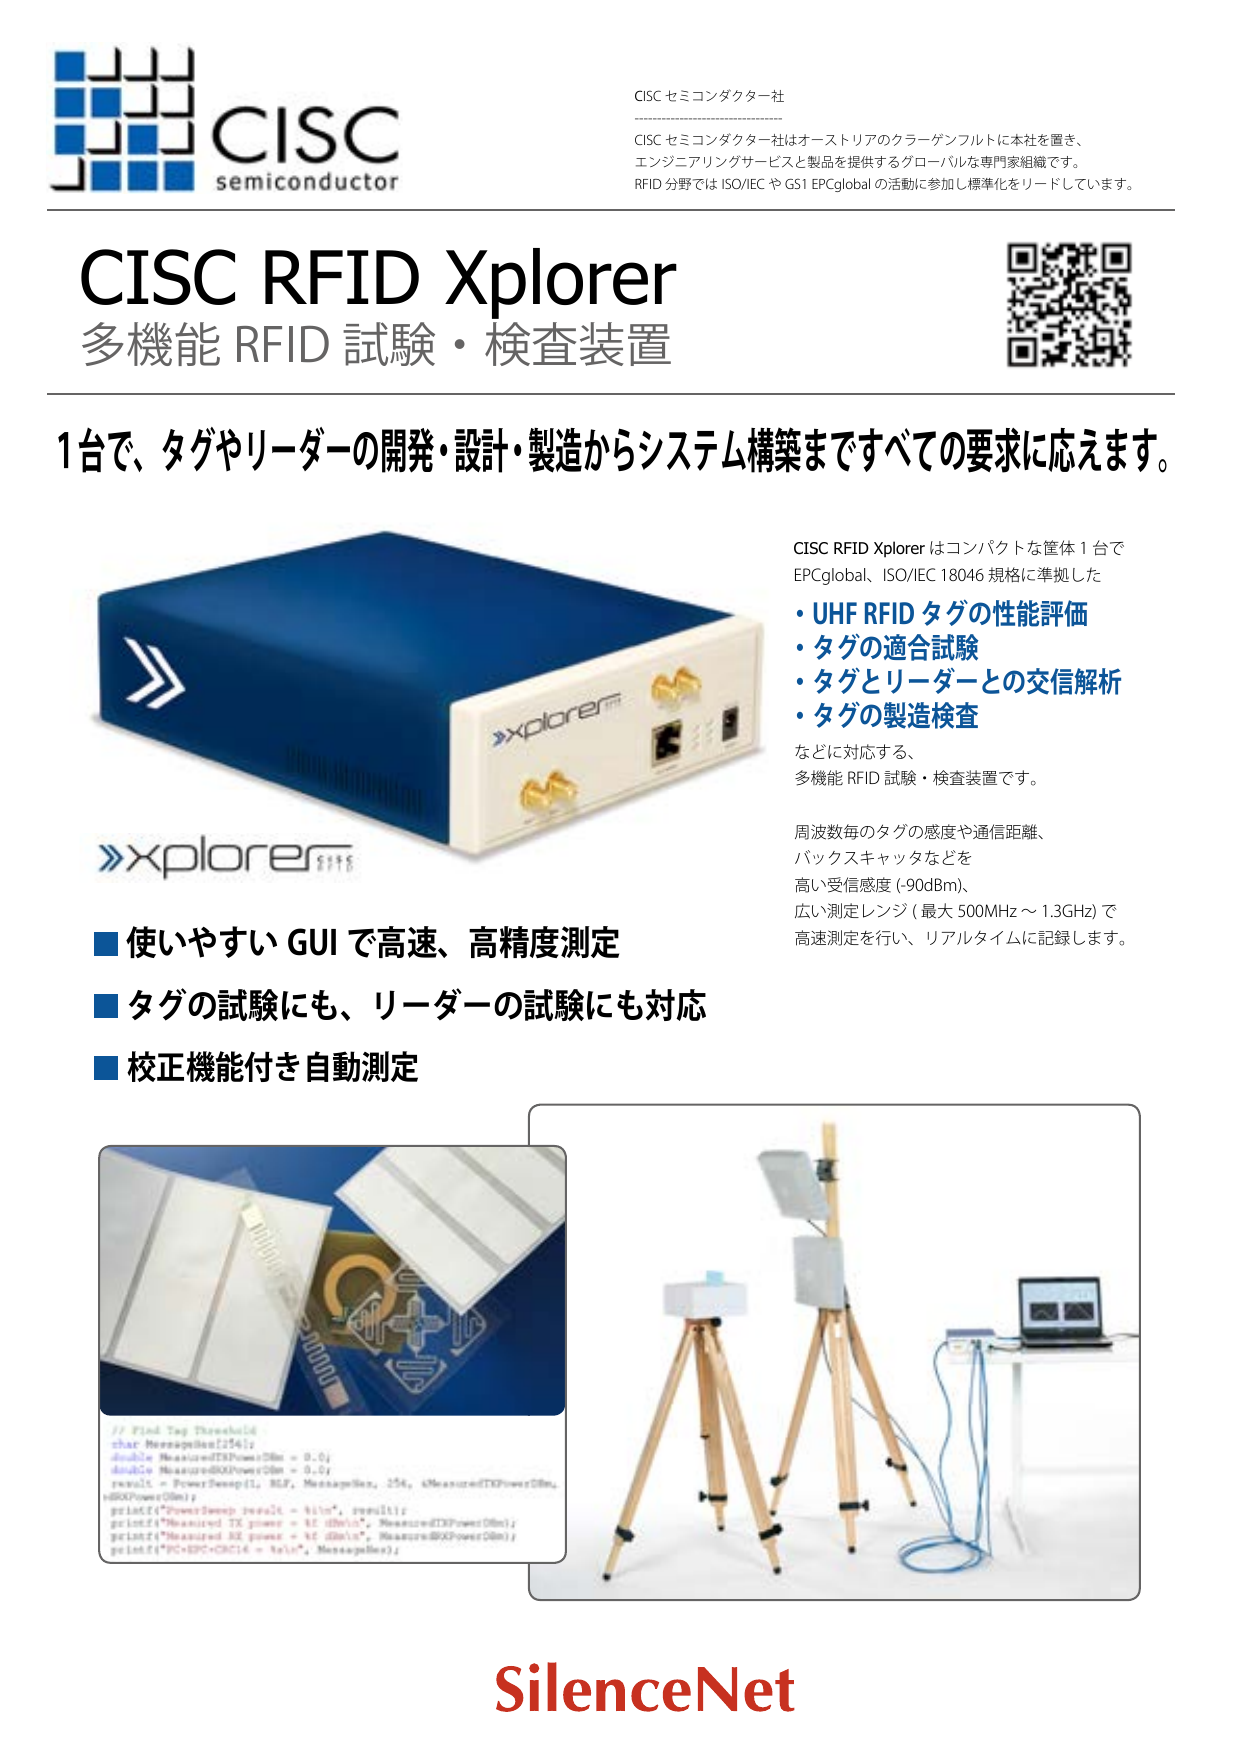 CISC RFID Xplorer 多機能RFID 試験・検査装置